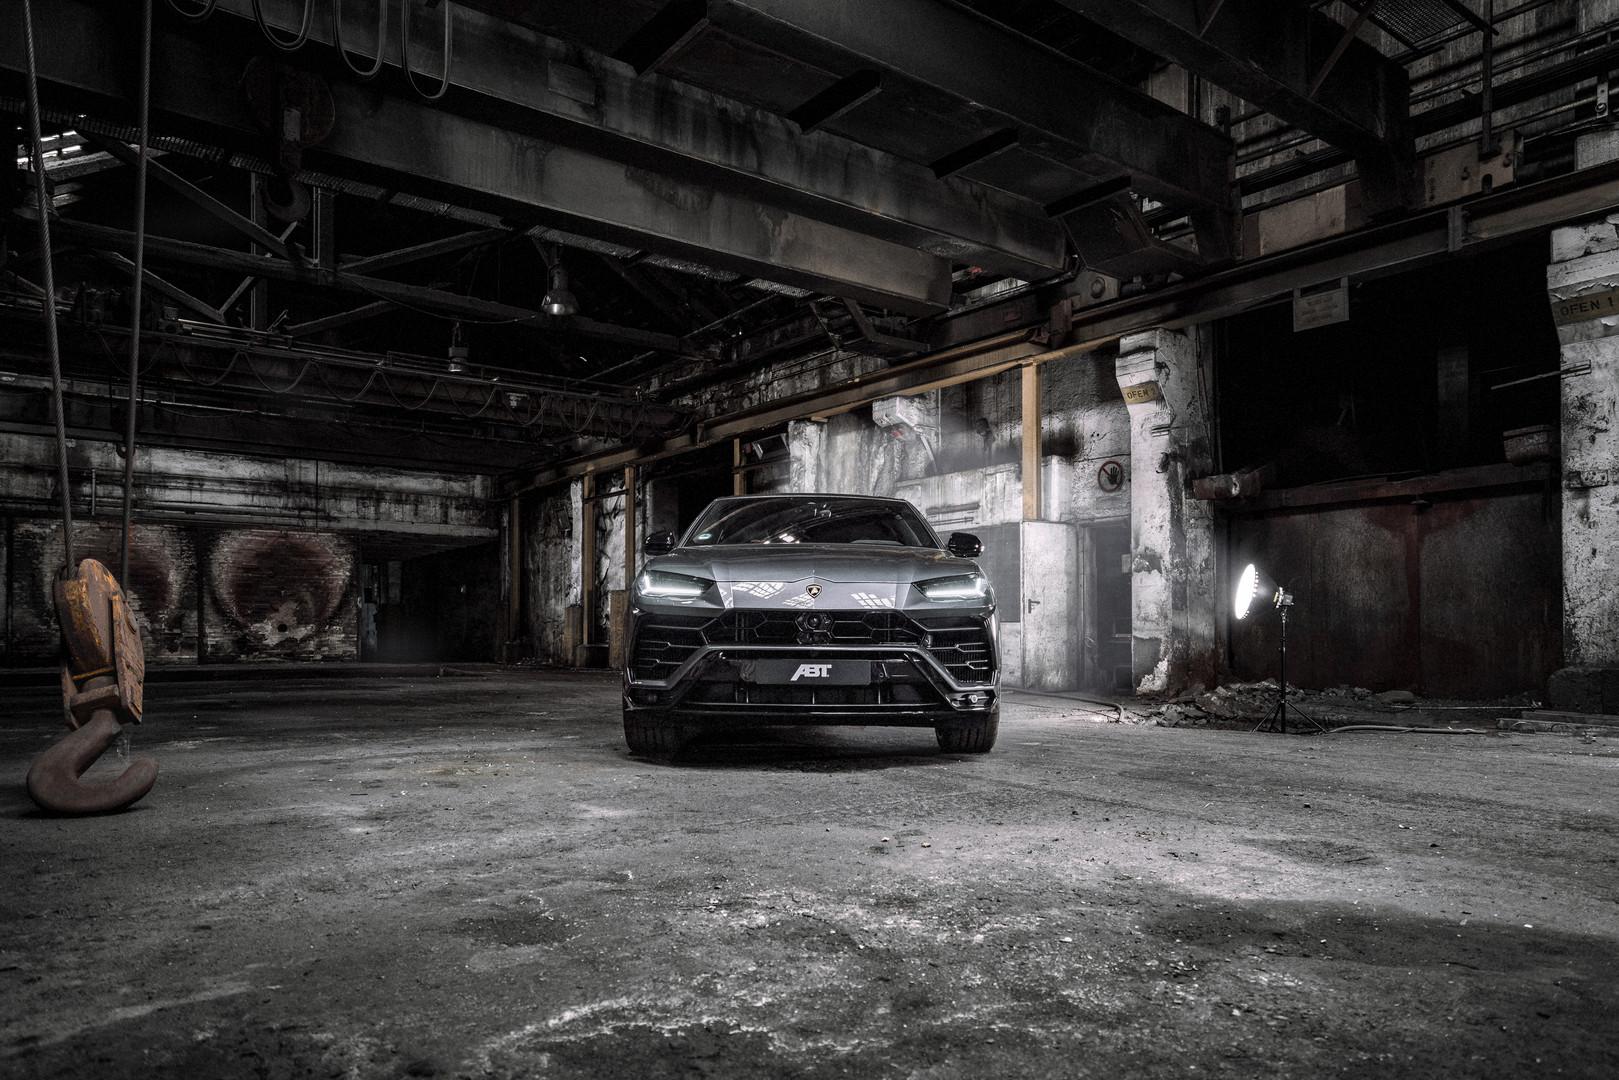 ABT Lamborghini Urus Front